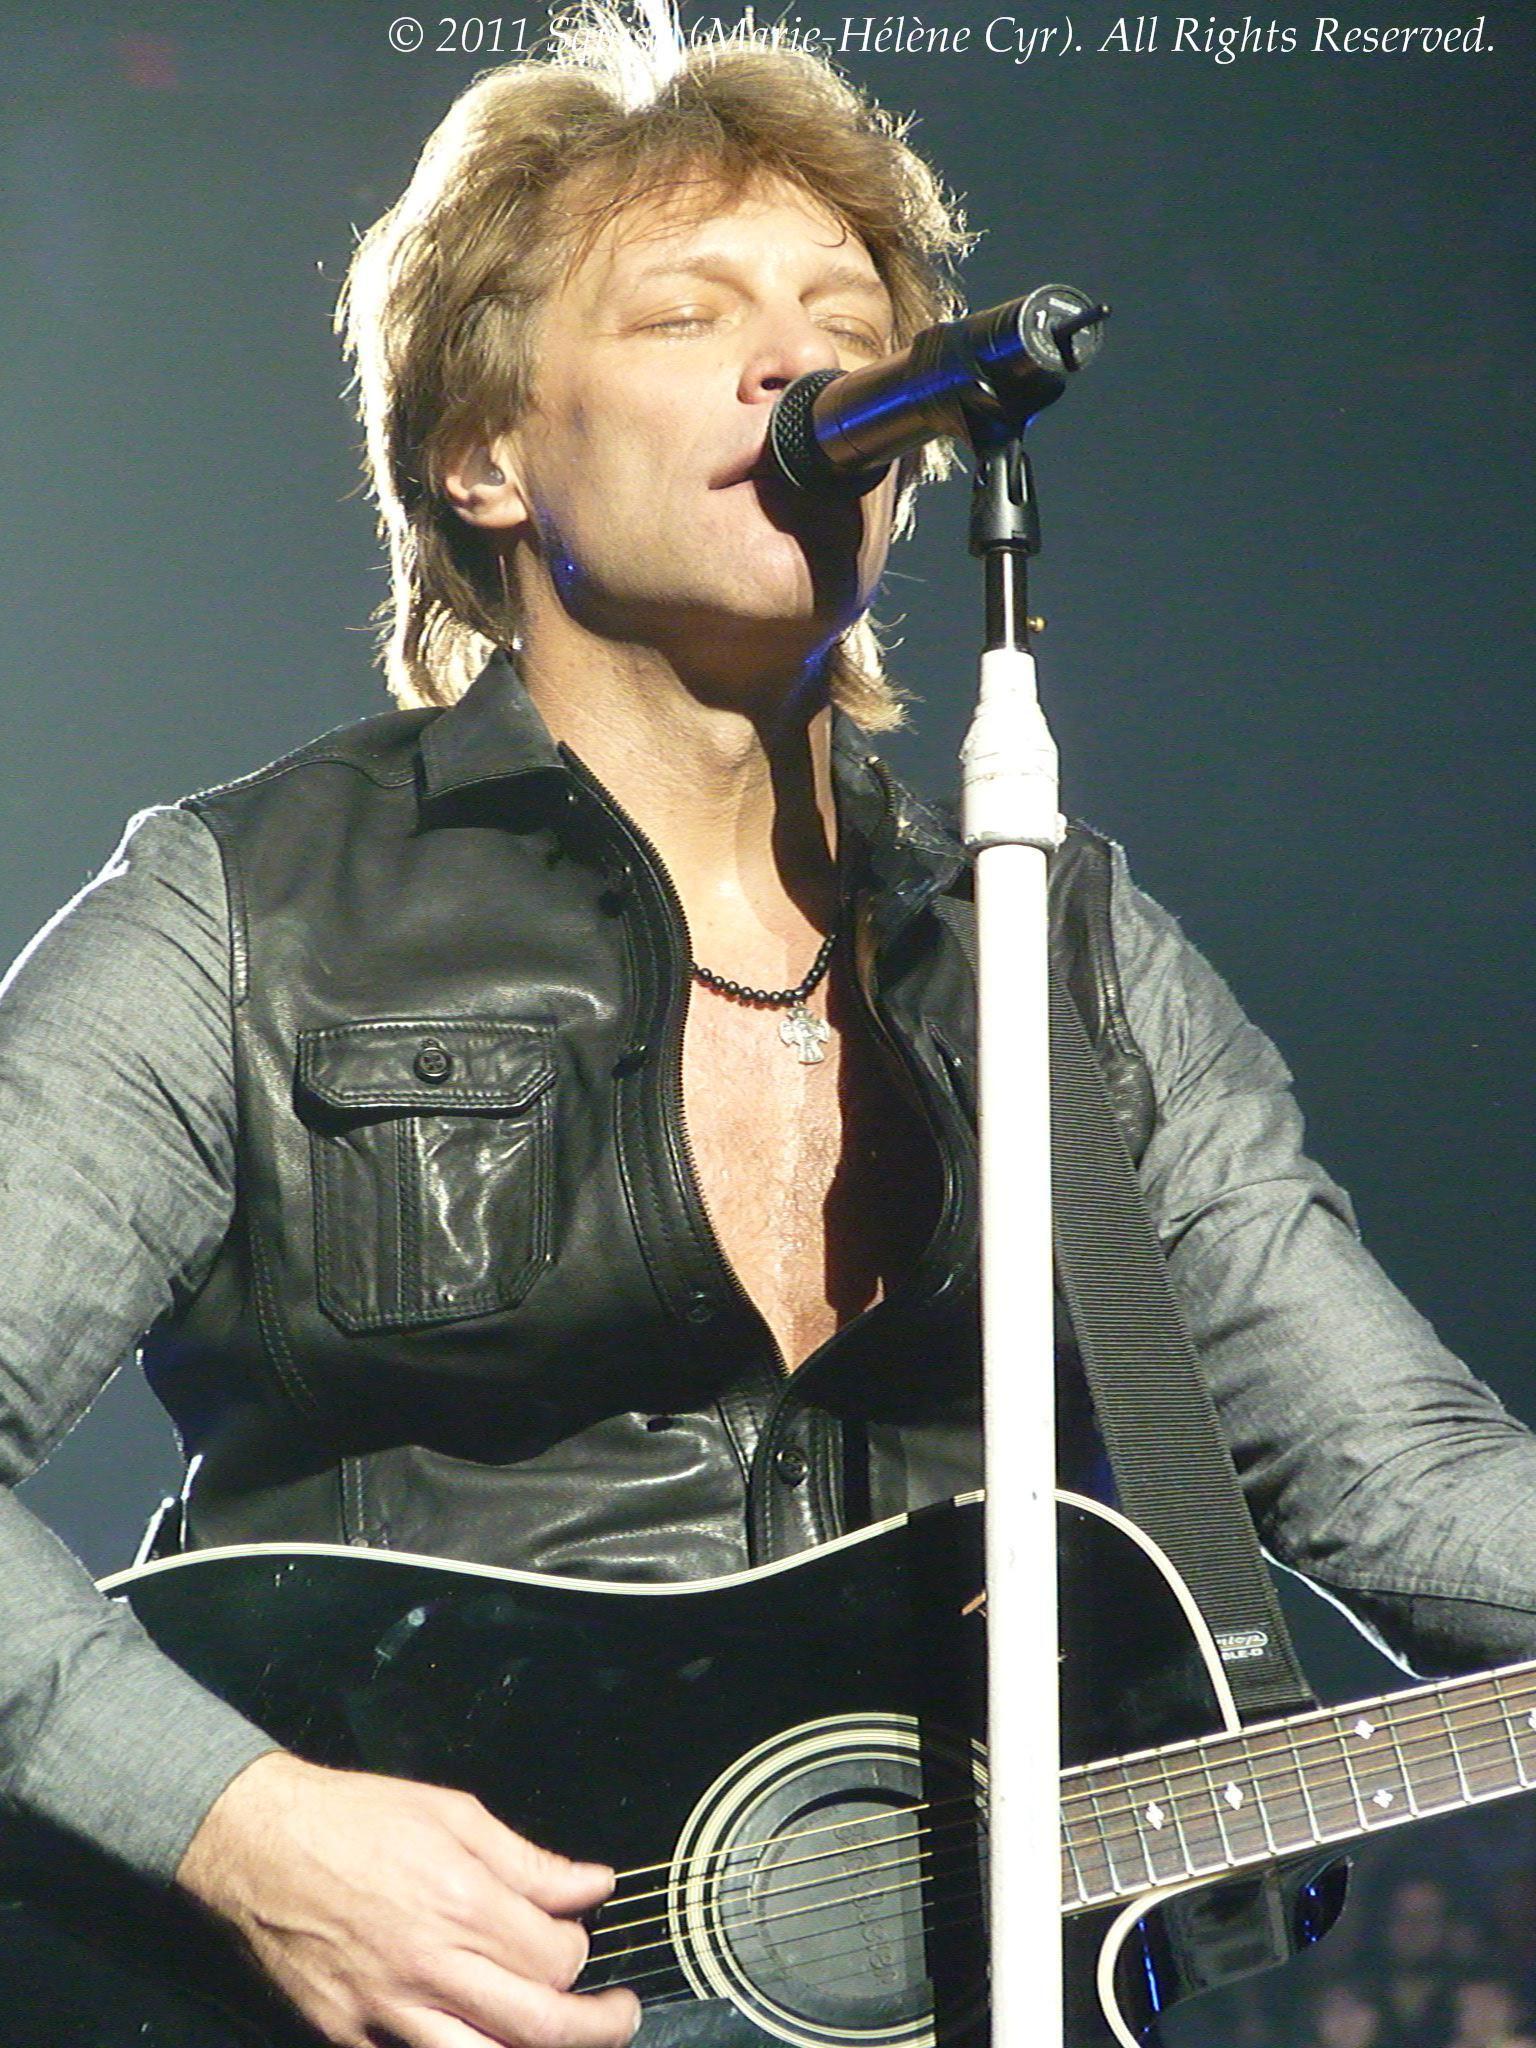 Bon Jovi - Centre Bell, Québec, Canada (19 février 2011)